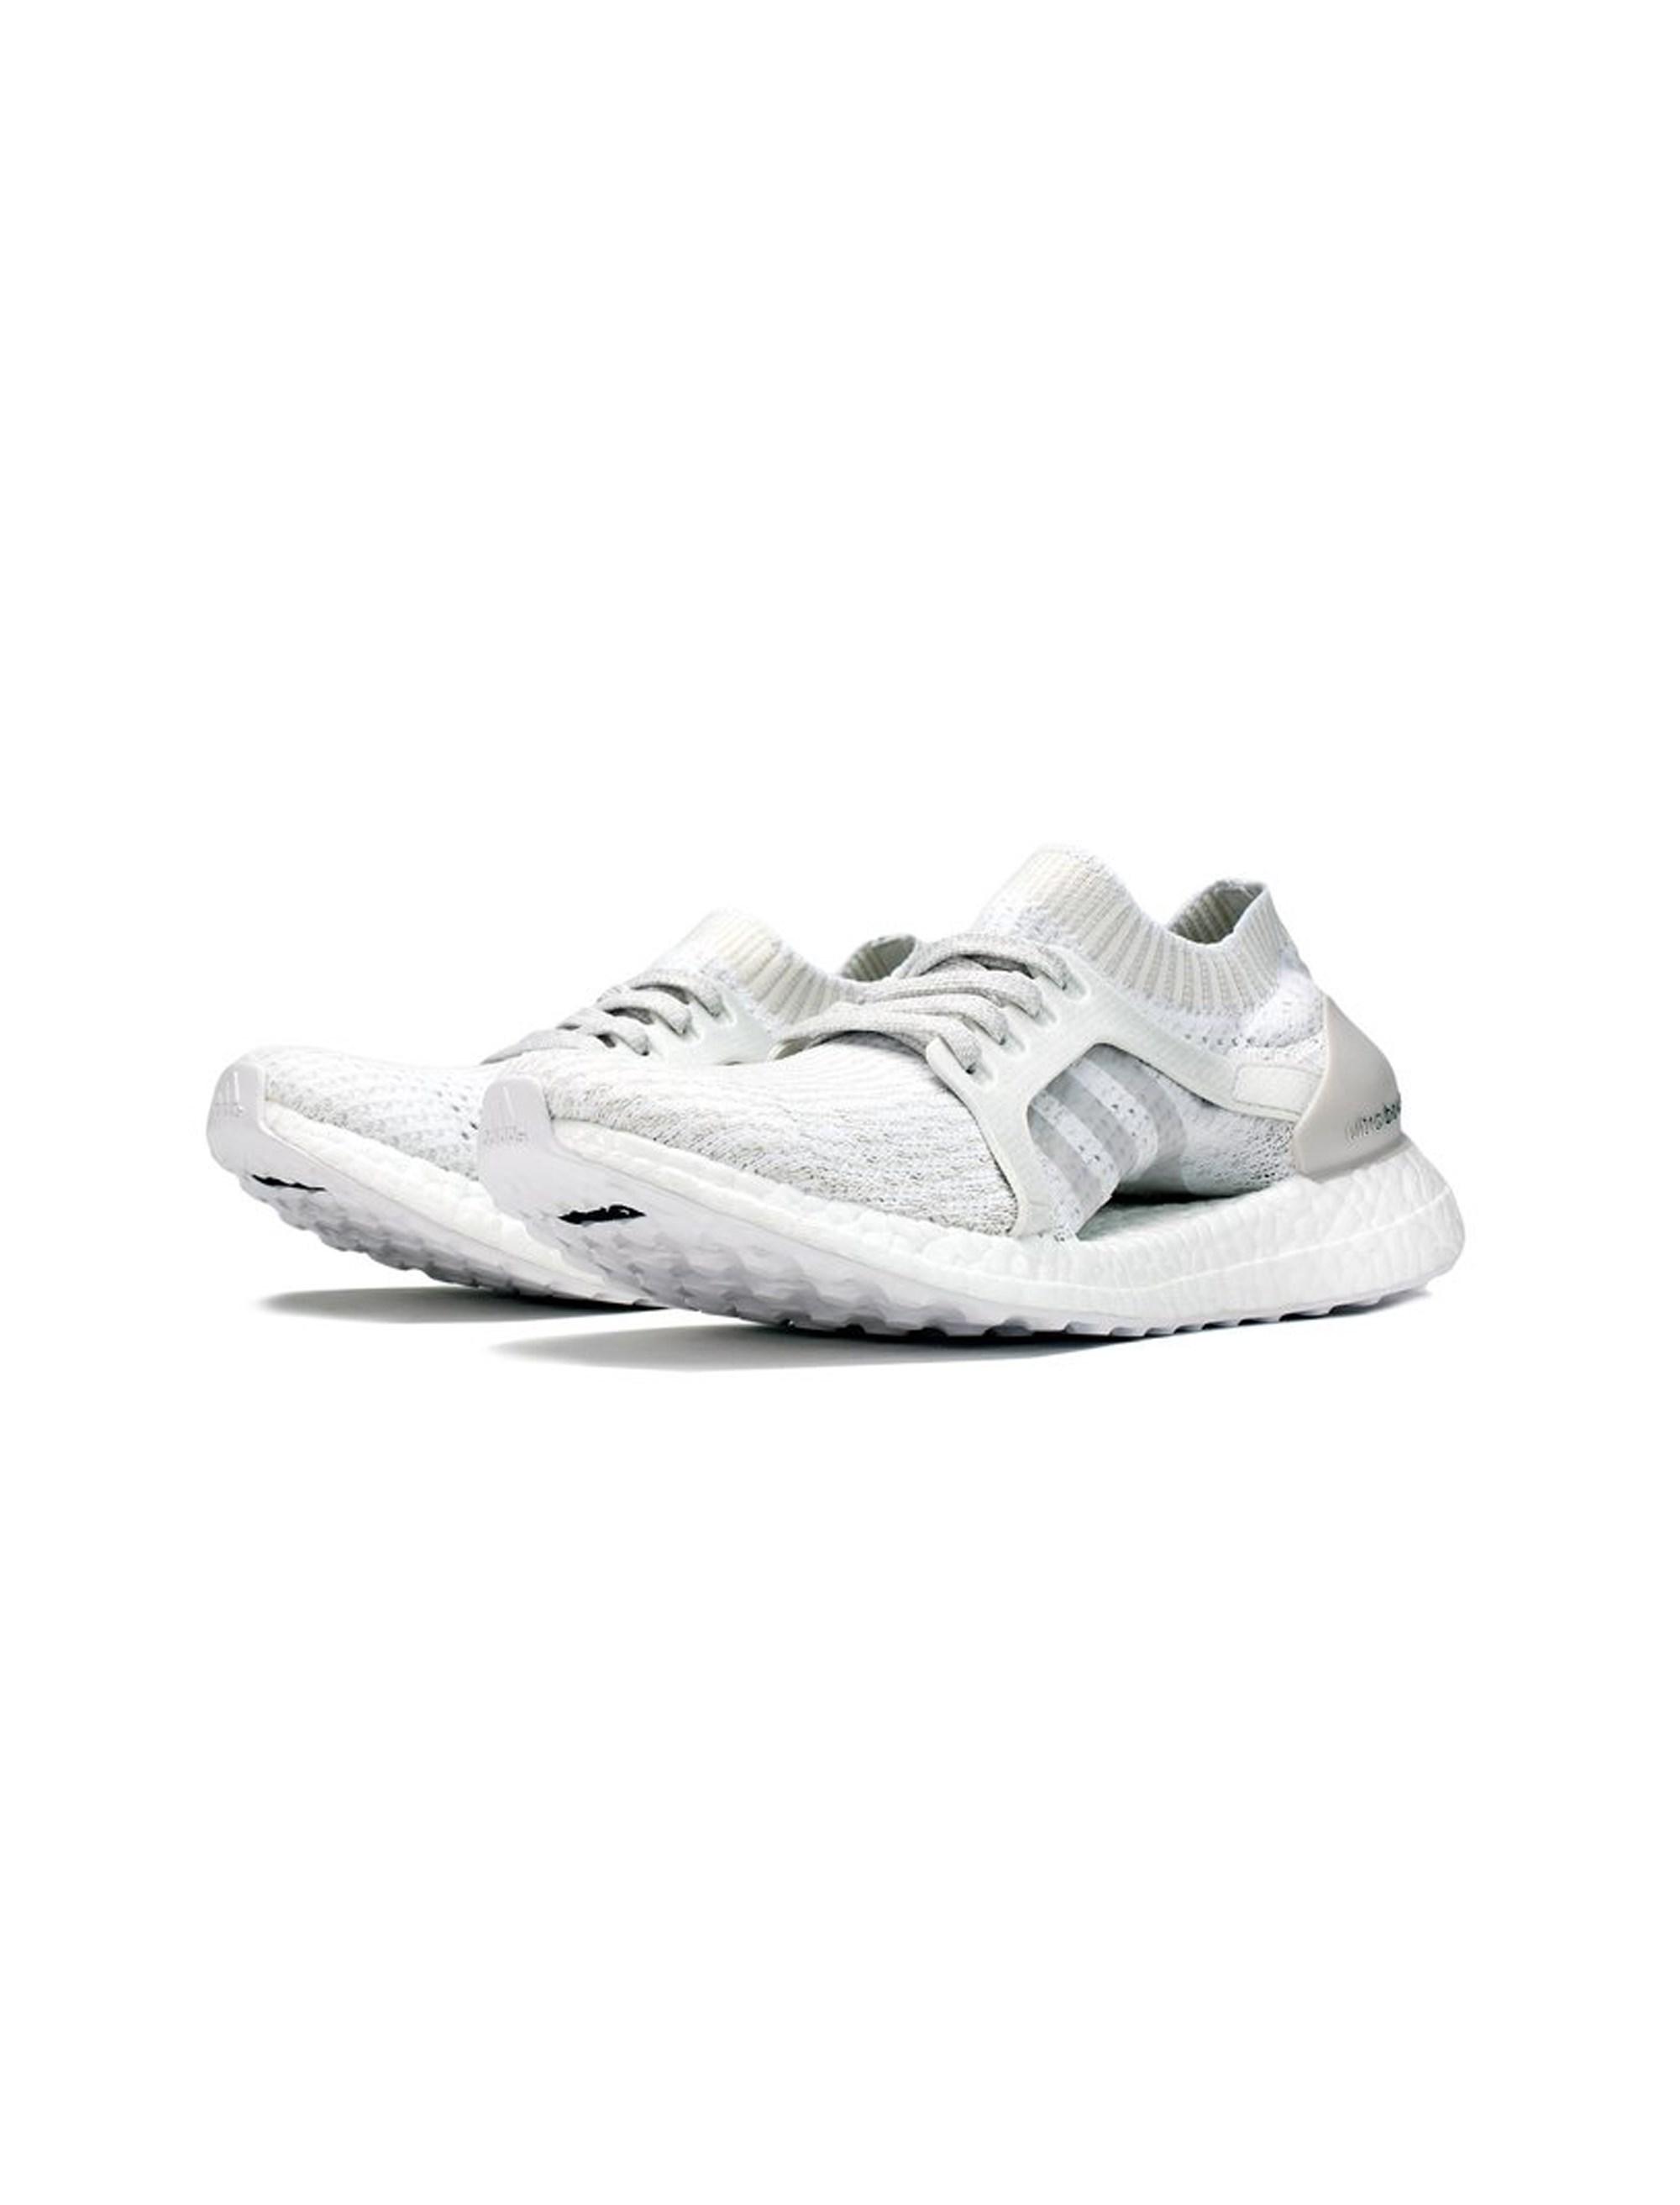 کفش مخصوص دویدن زنانه آدیداس مدل ULTRABOOST X